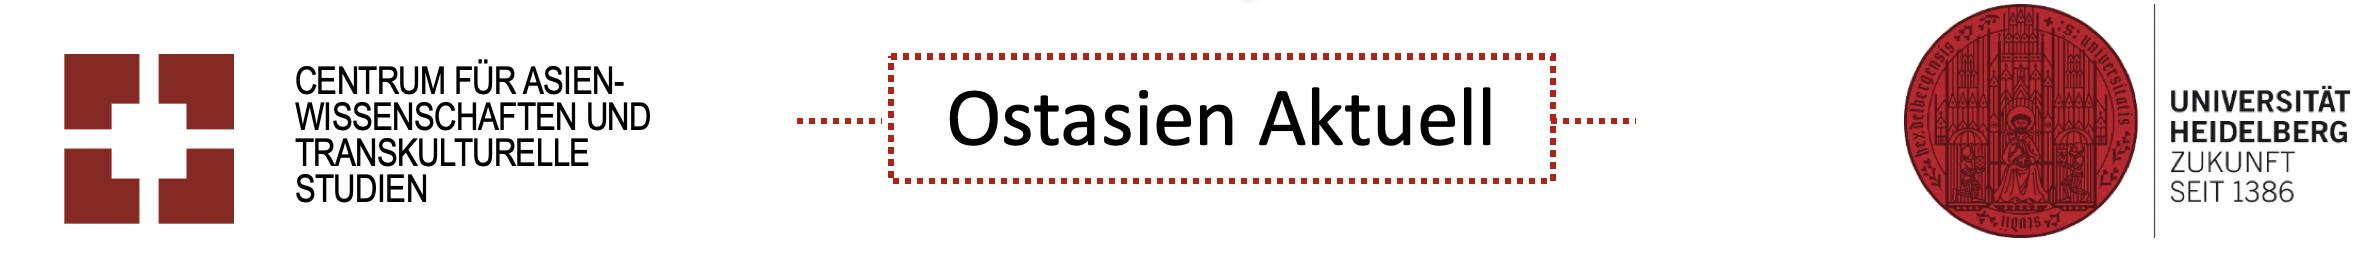 Ostasien Aktuell